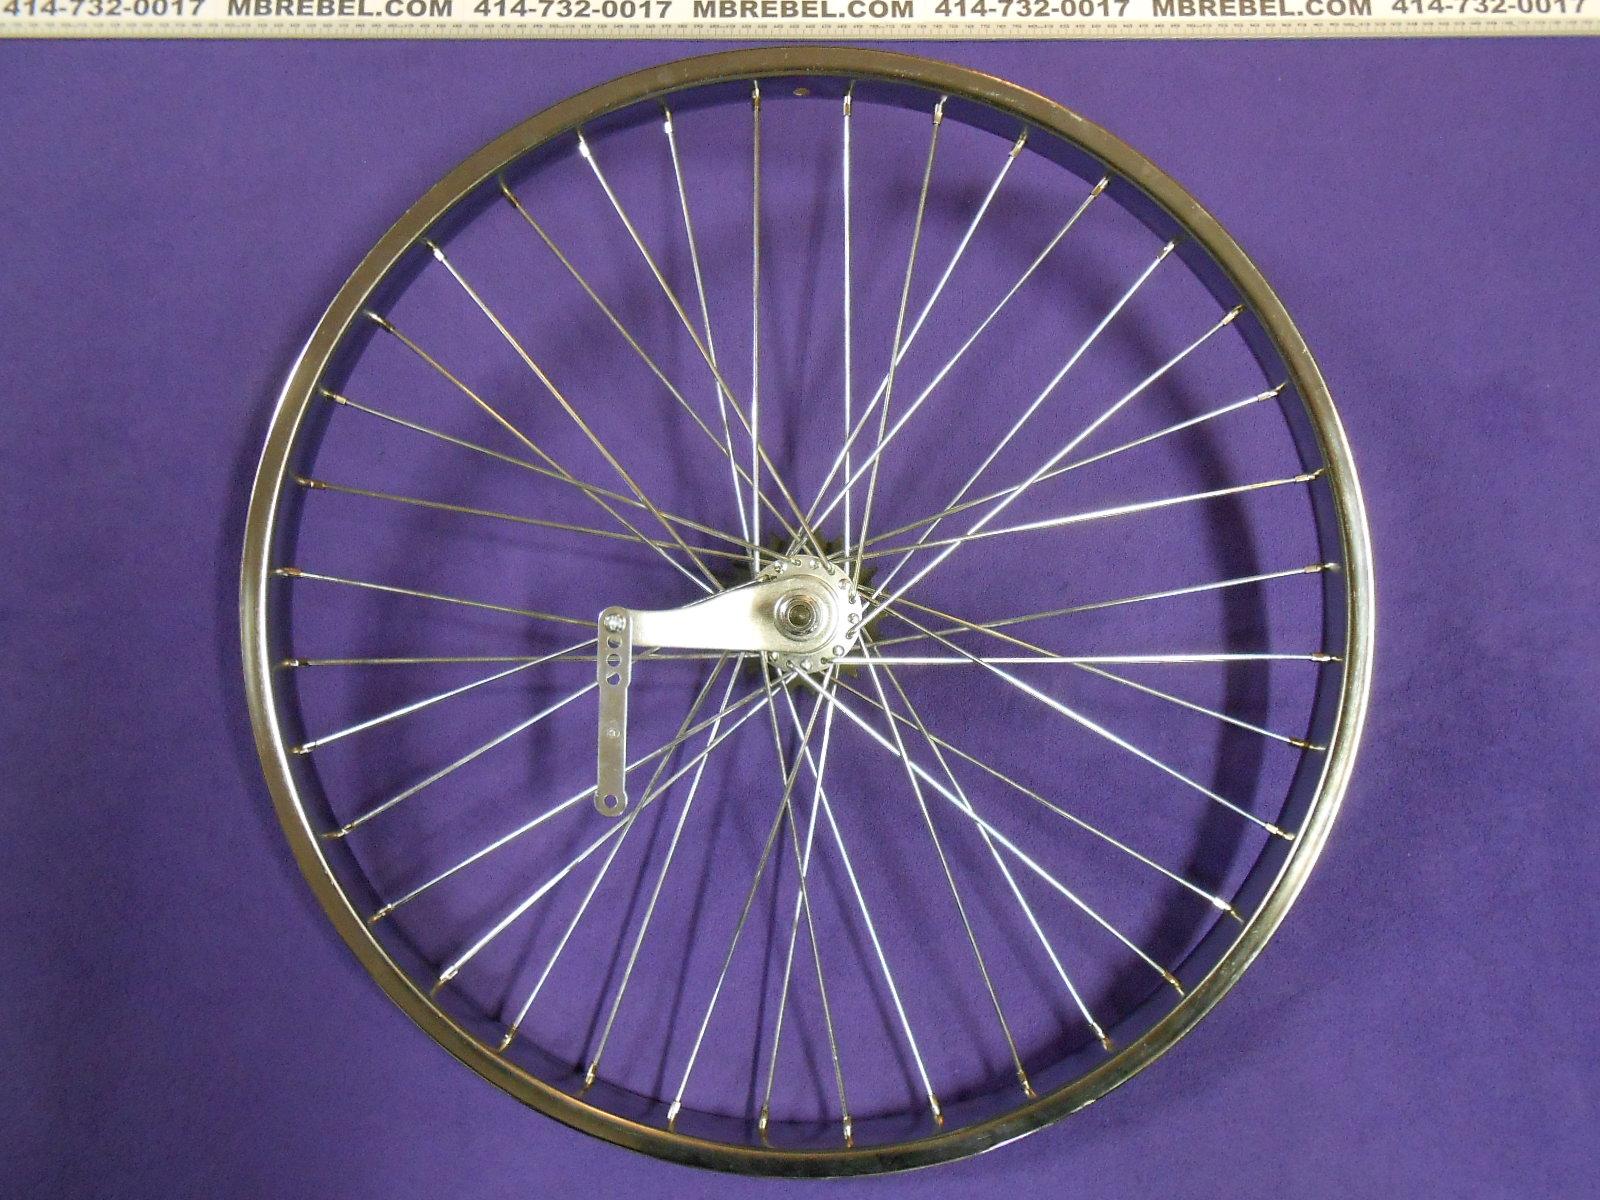 "Bicycle Wheel 26/"" x 2.125 x 12g Heavy Duty Rear Alloy Black Coaster Brake NEW"